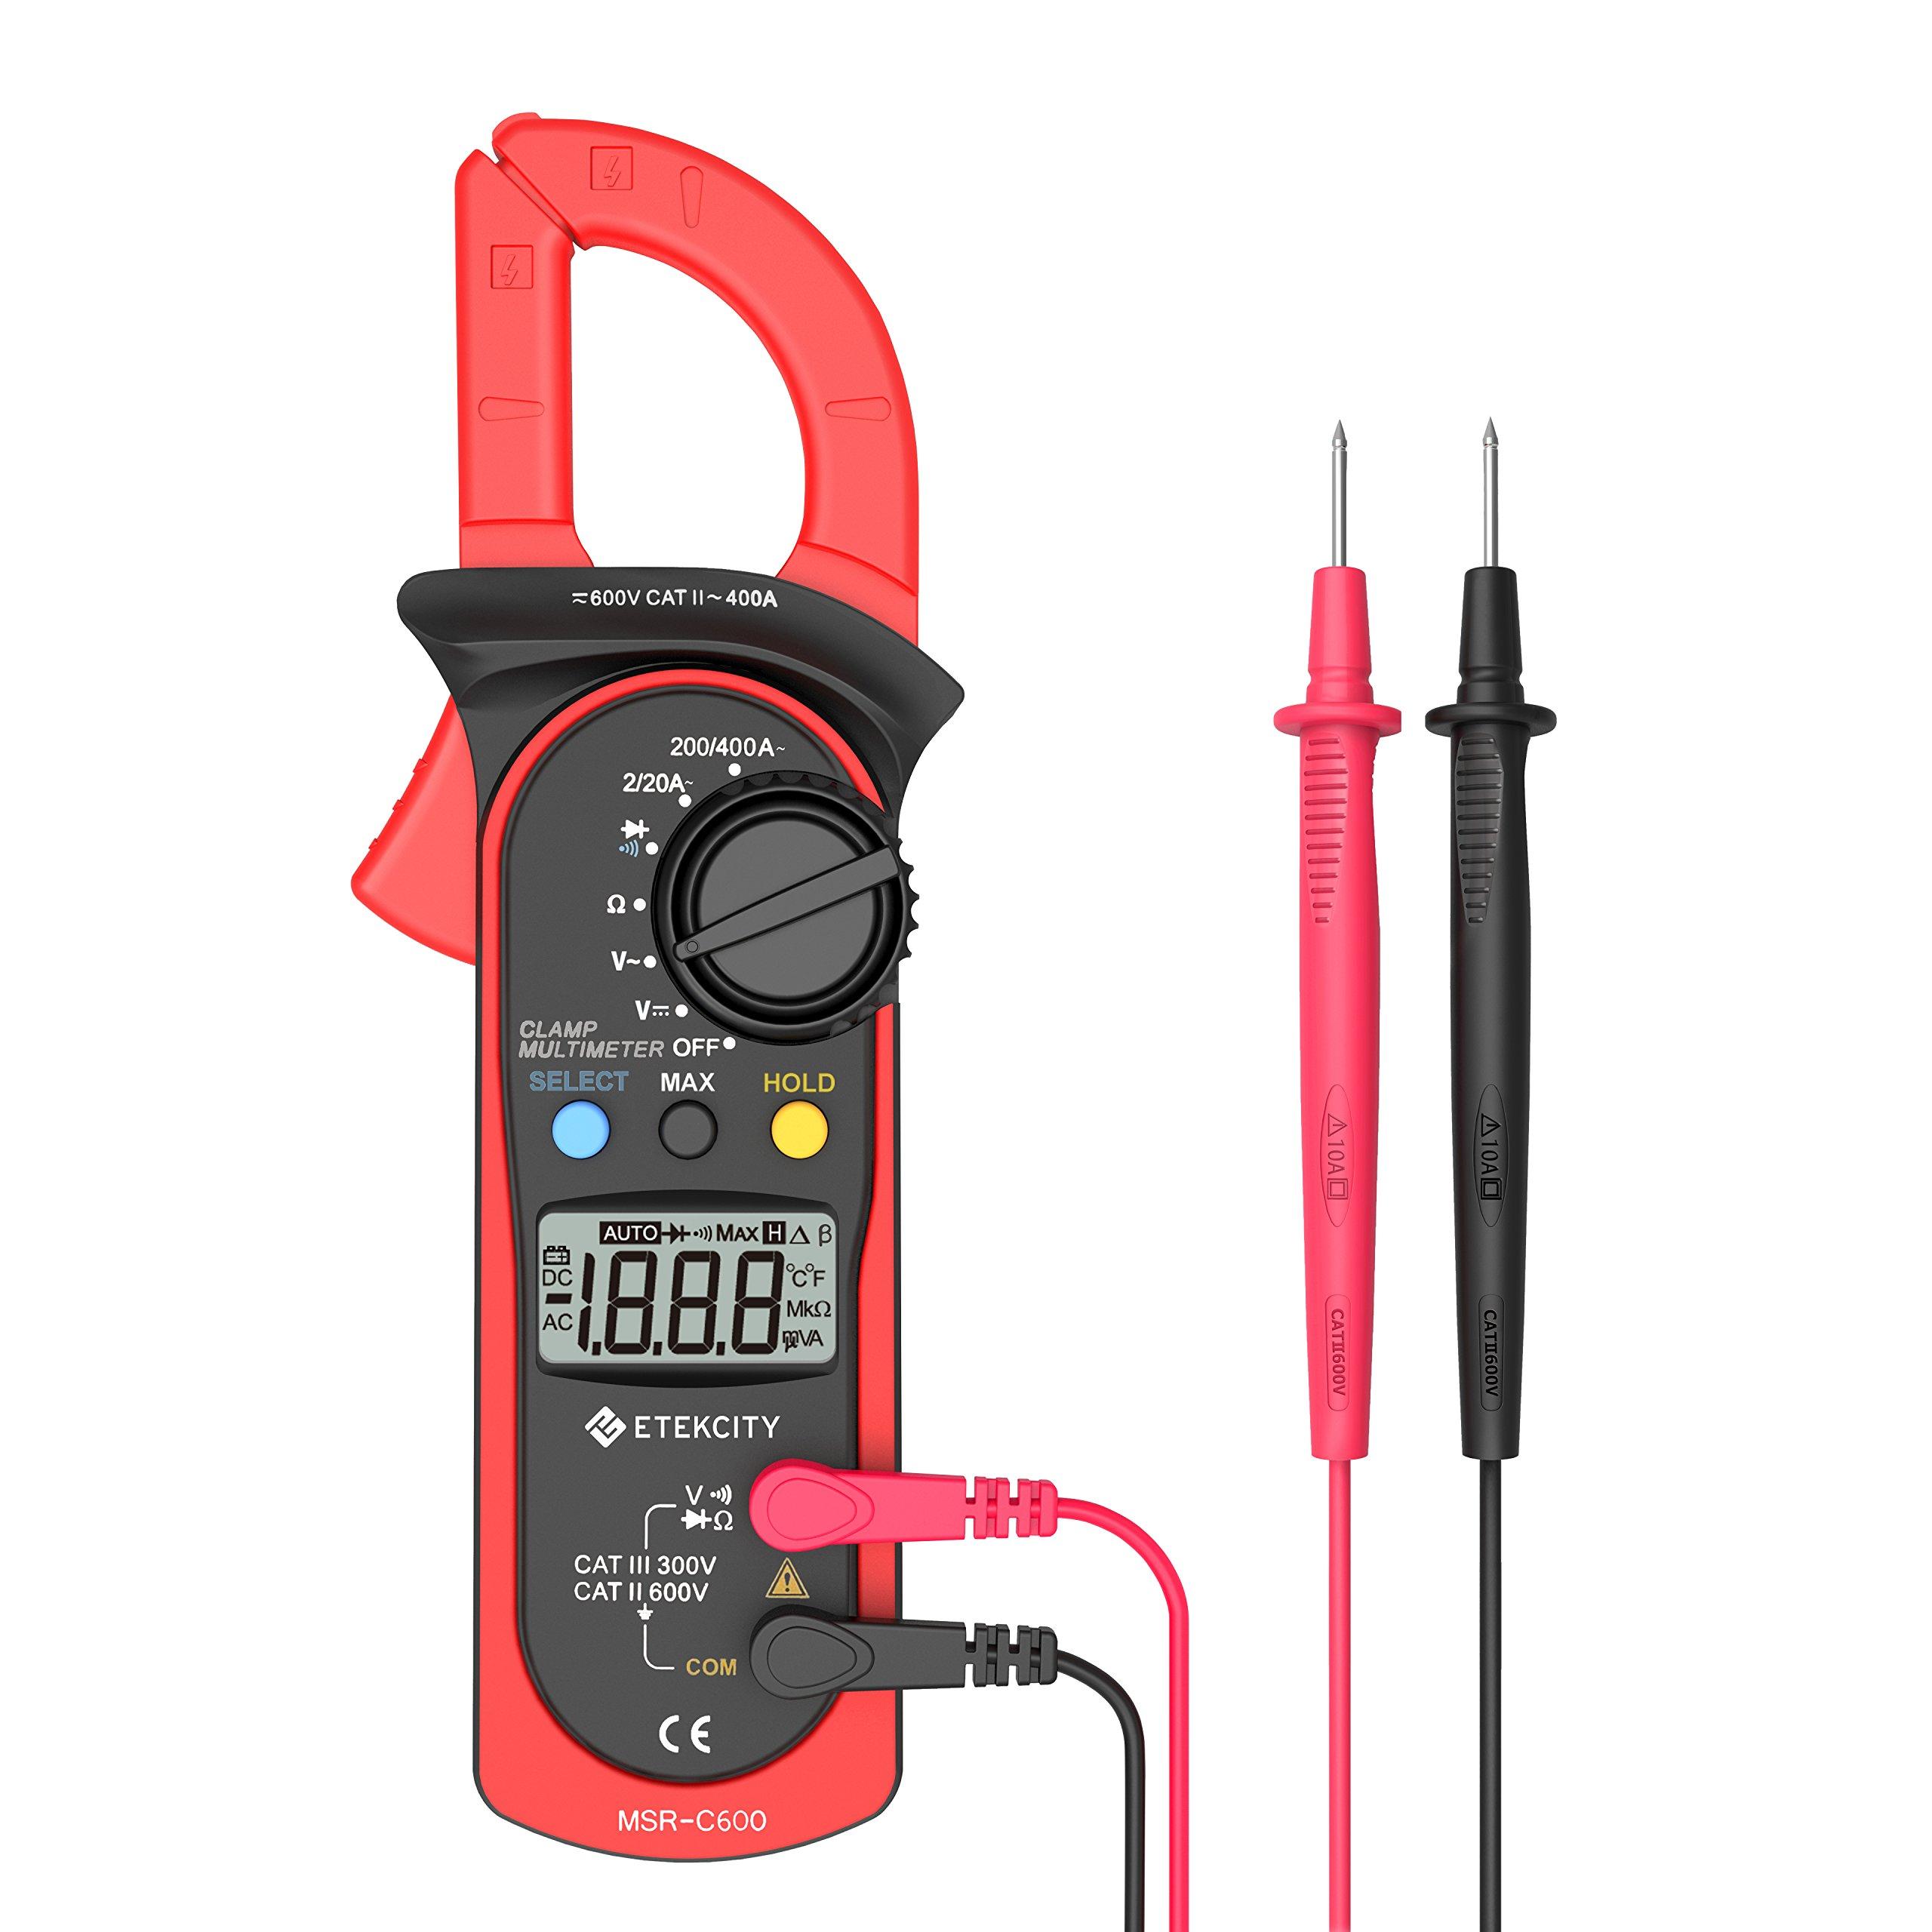 Etekcity MSR-C600 Digital Clamp Meter Multimeters, Auto-Ranging Multimeter AC/DC voltmeter with Voltage, AC Current, Amp, Volt, Ohm, Diode and Resistance Test Tester by Etekcity